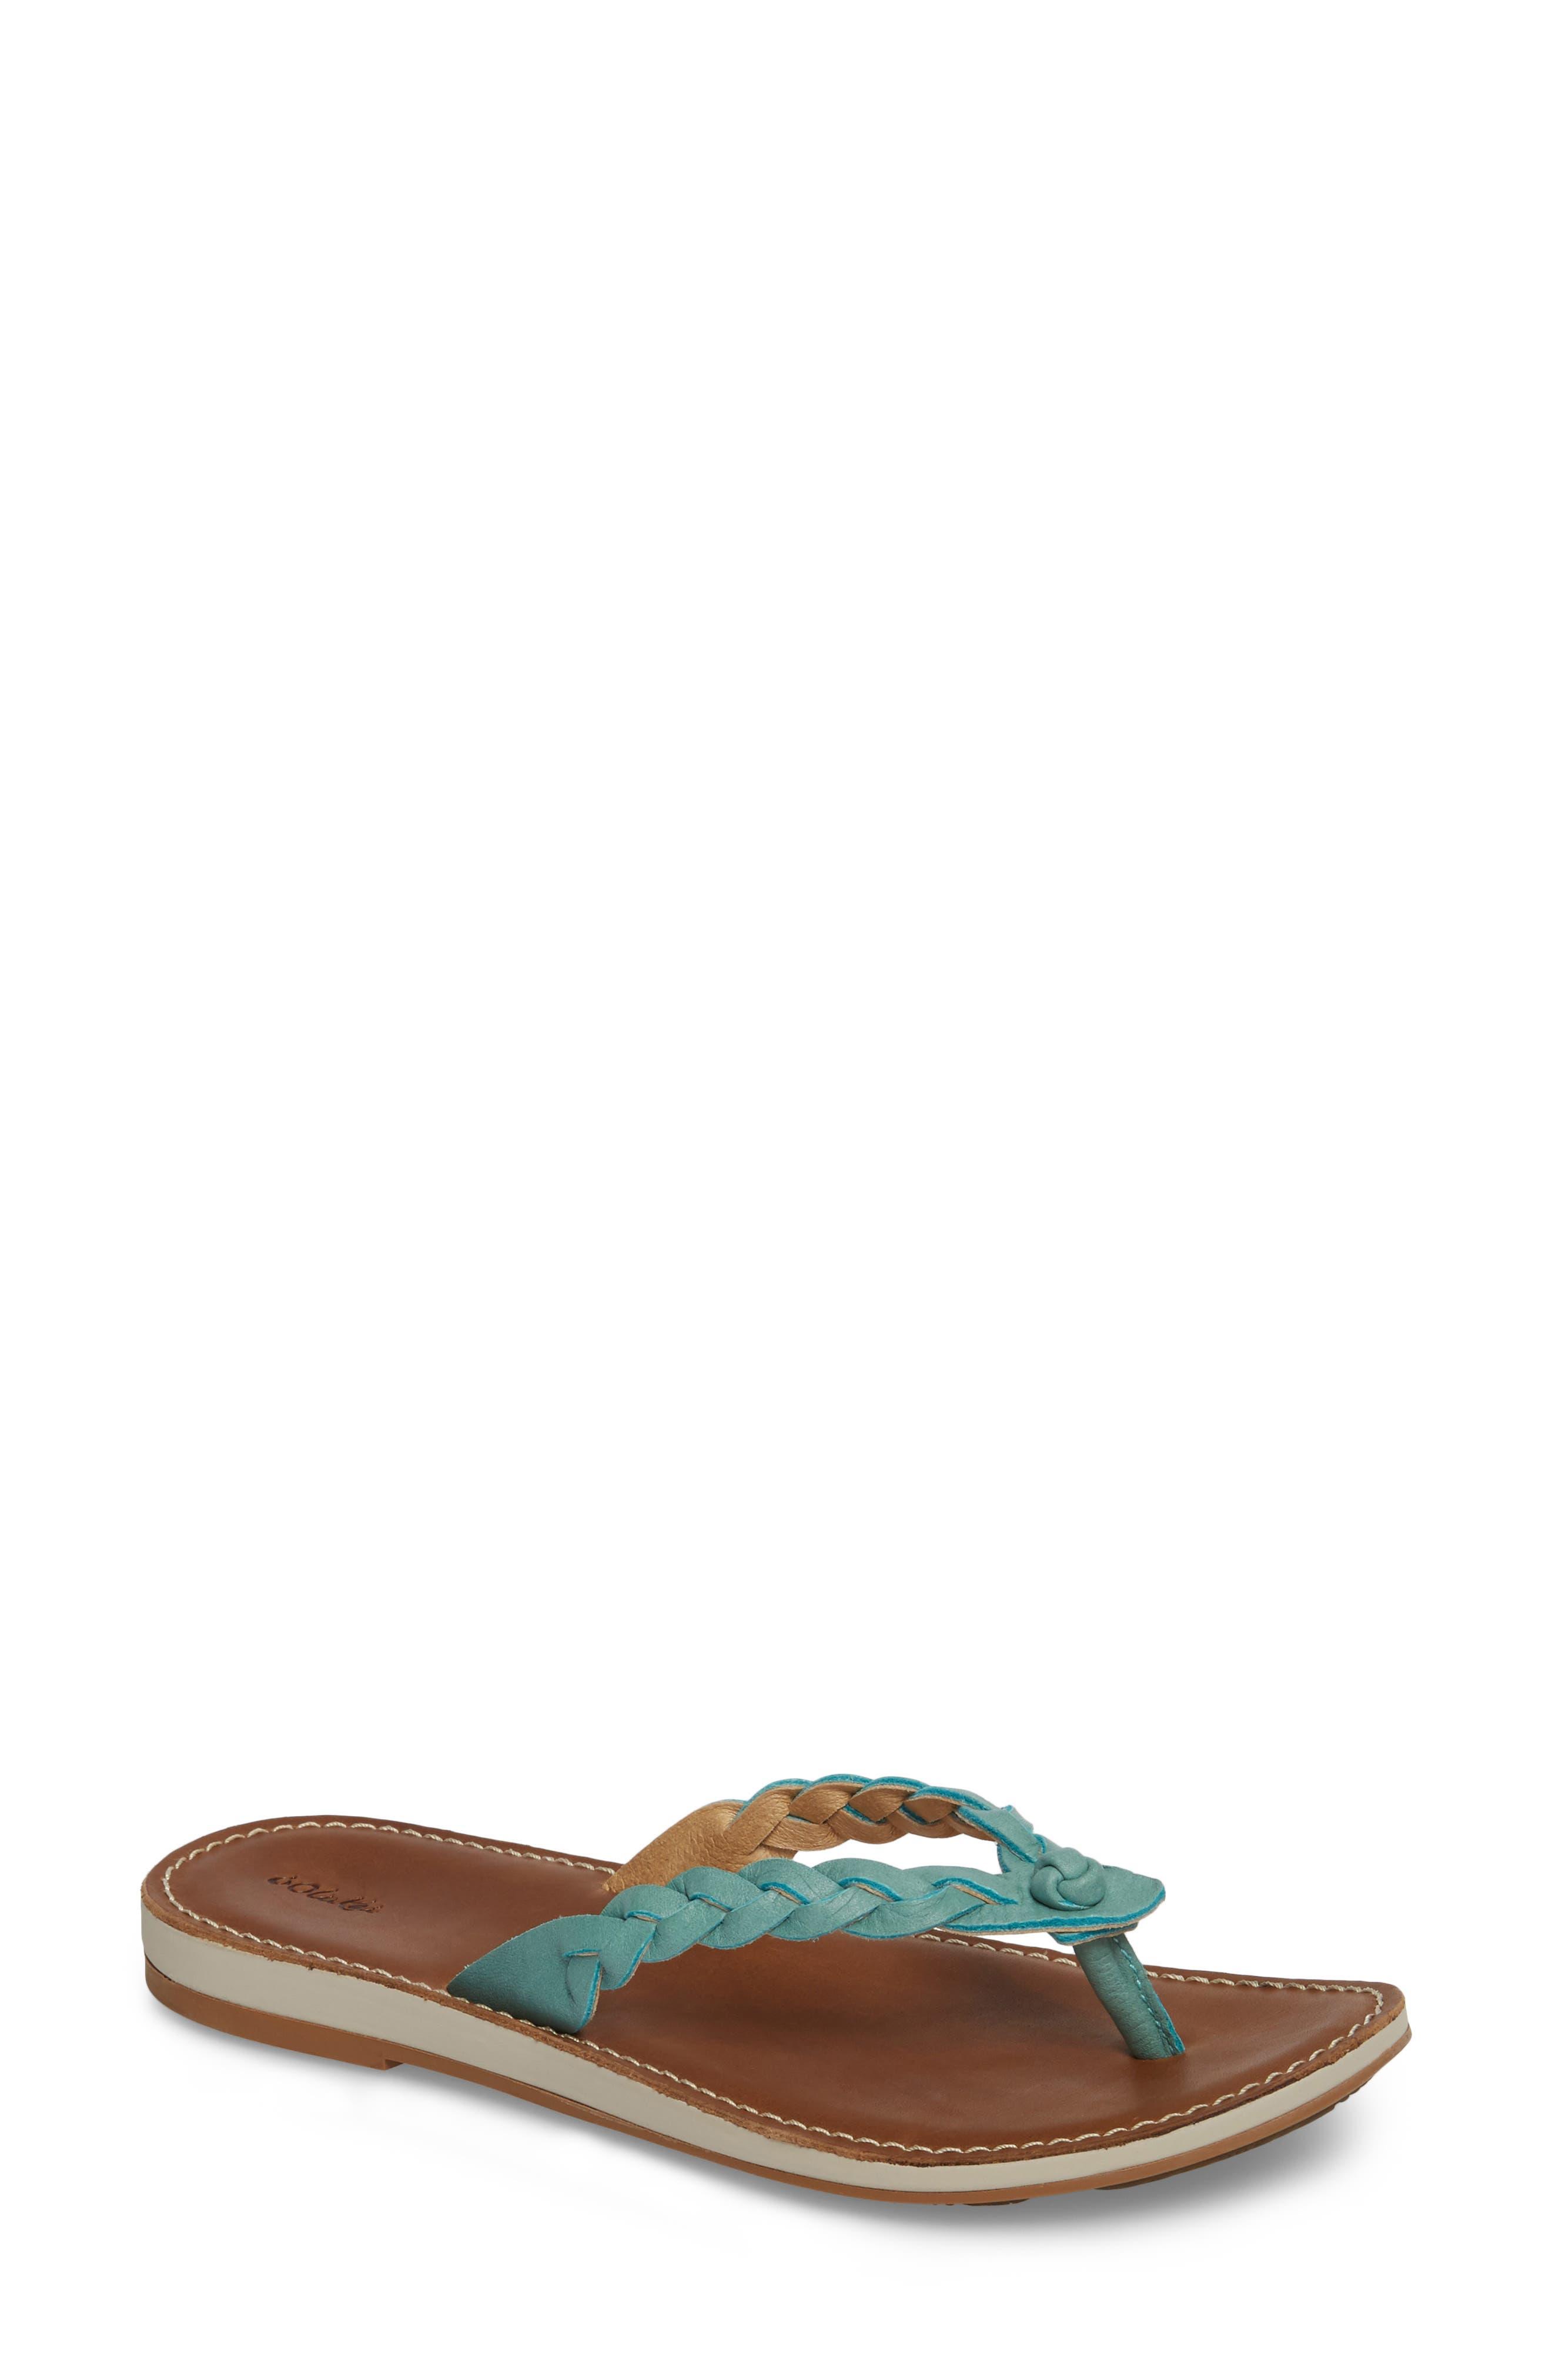 Kahiko Flip-Flop,                             Main thumbnail 1, color,                             Sea/ Tan Leather